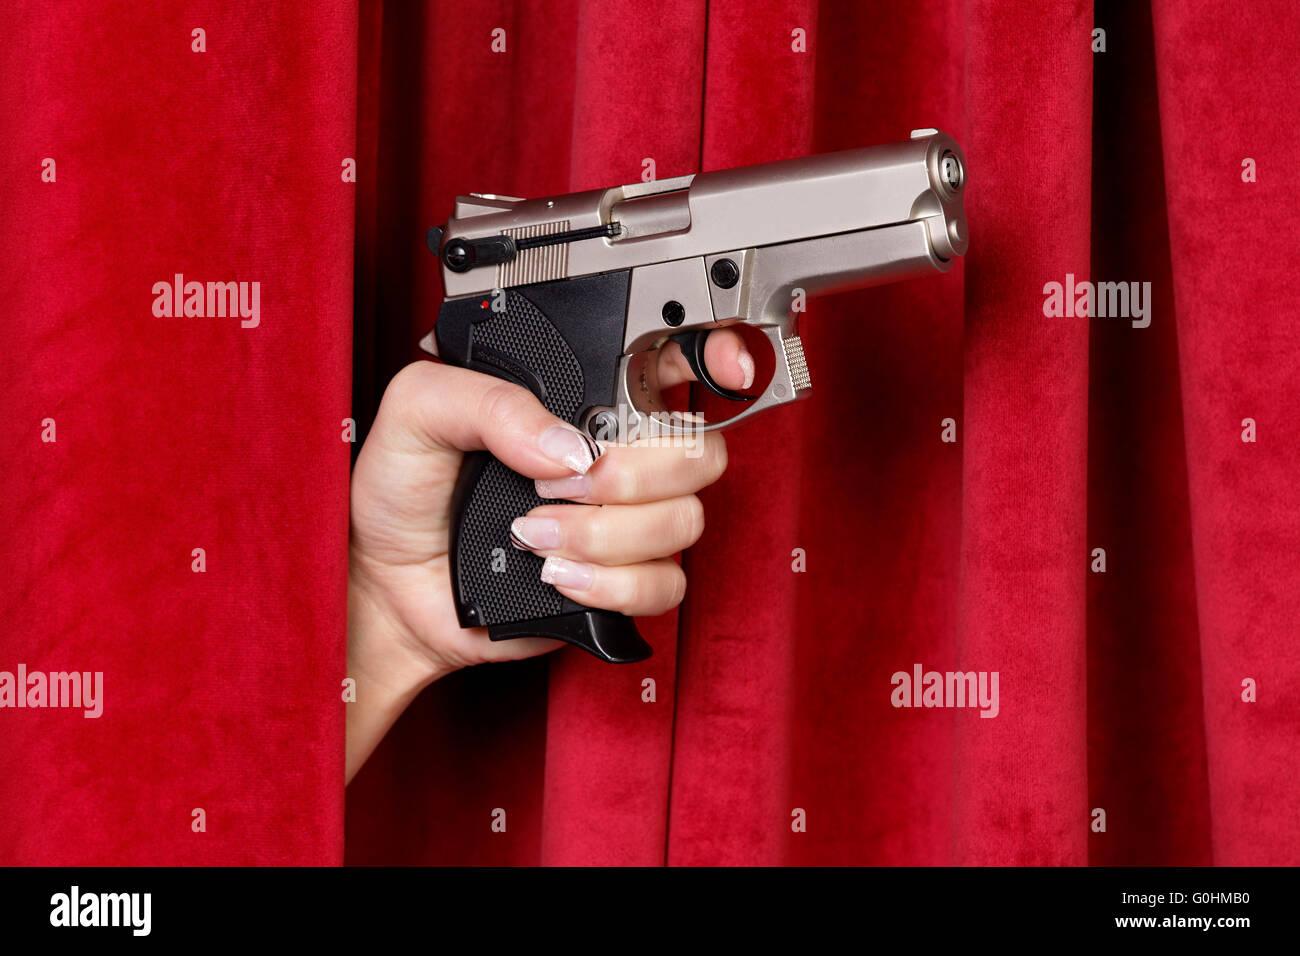 Ladie's hand holding a gun Stock Photo